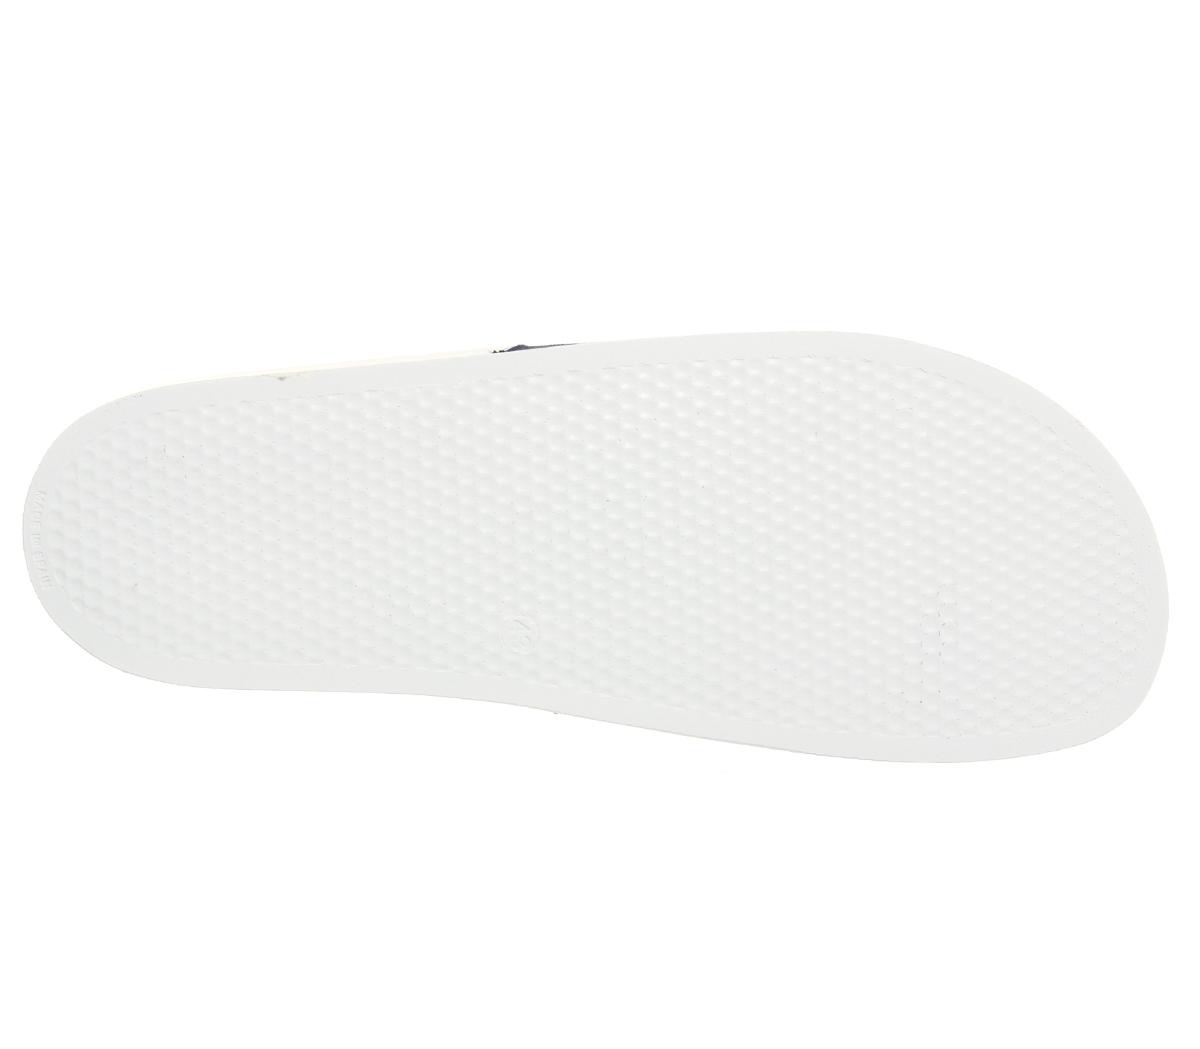 af4d7a942a4e Mens-Office-Flume-Elastic-Slides-Navy-Stripe-Sandals thumbnail